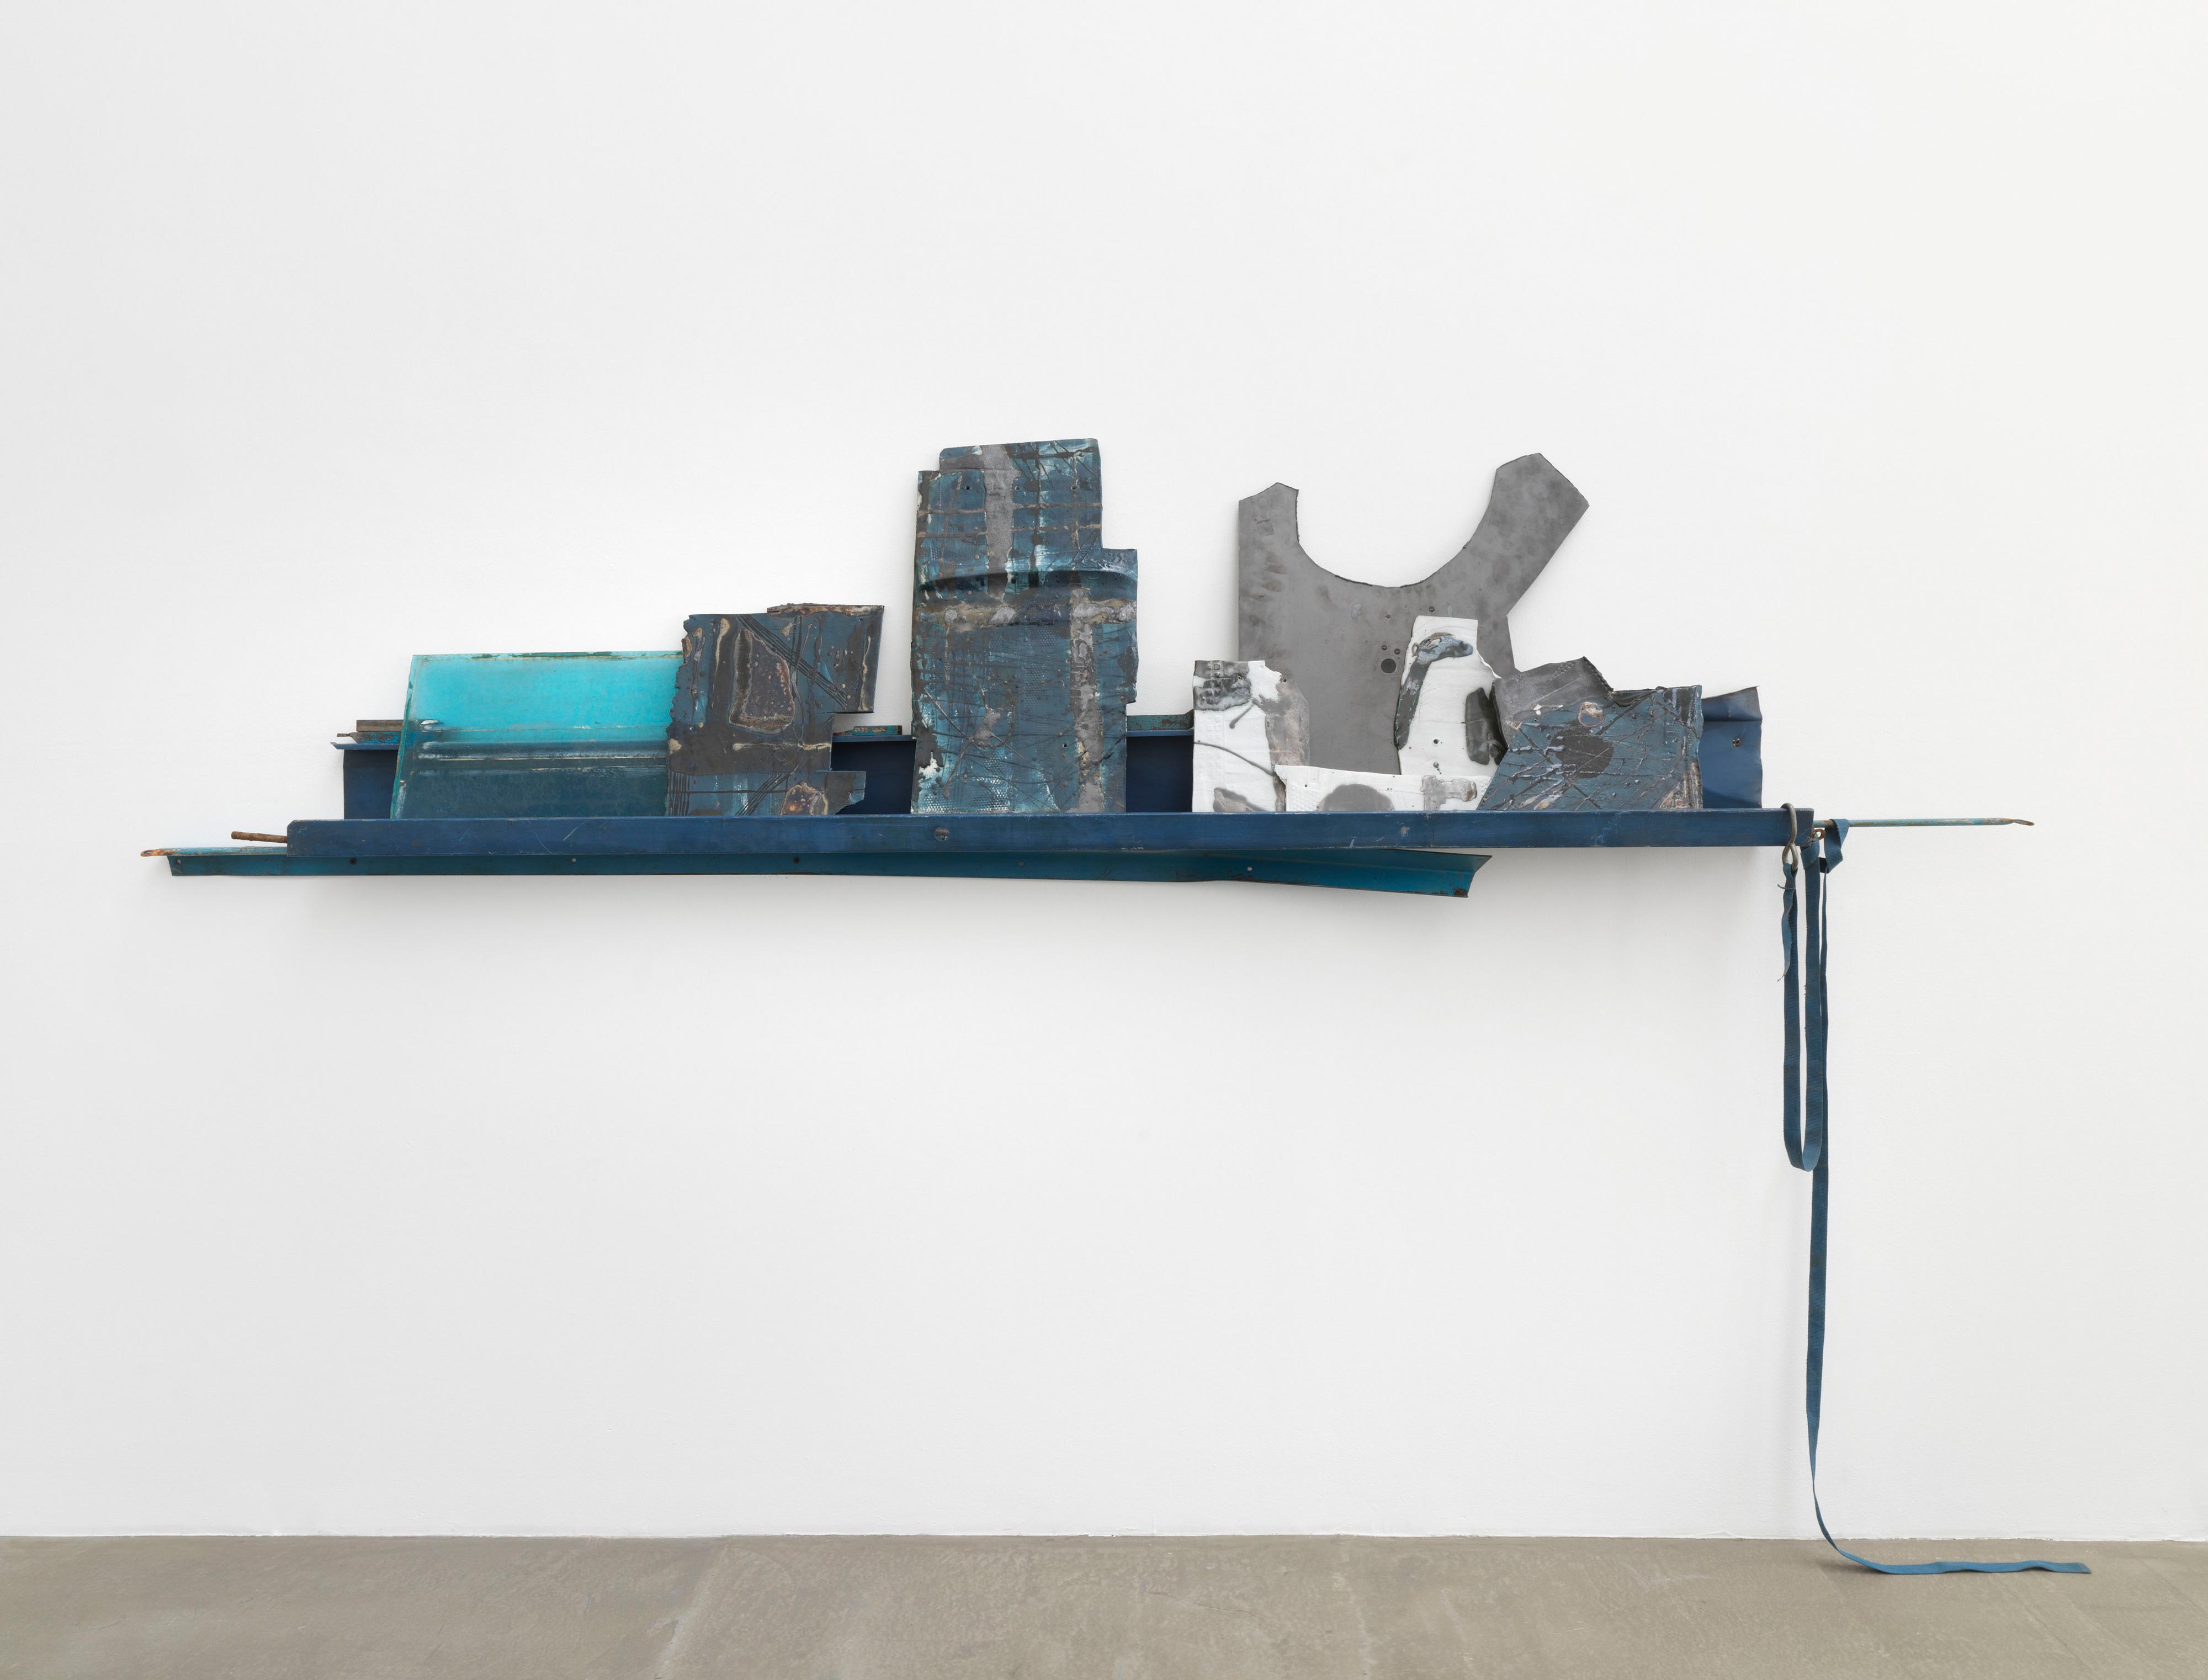 Galerie Barbara Thumm \ Sarah Entwistle: He lived alone with his books. (SEn-21-016) \ He lived alone with his books. (2021)